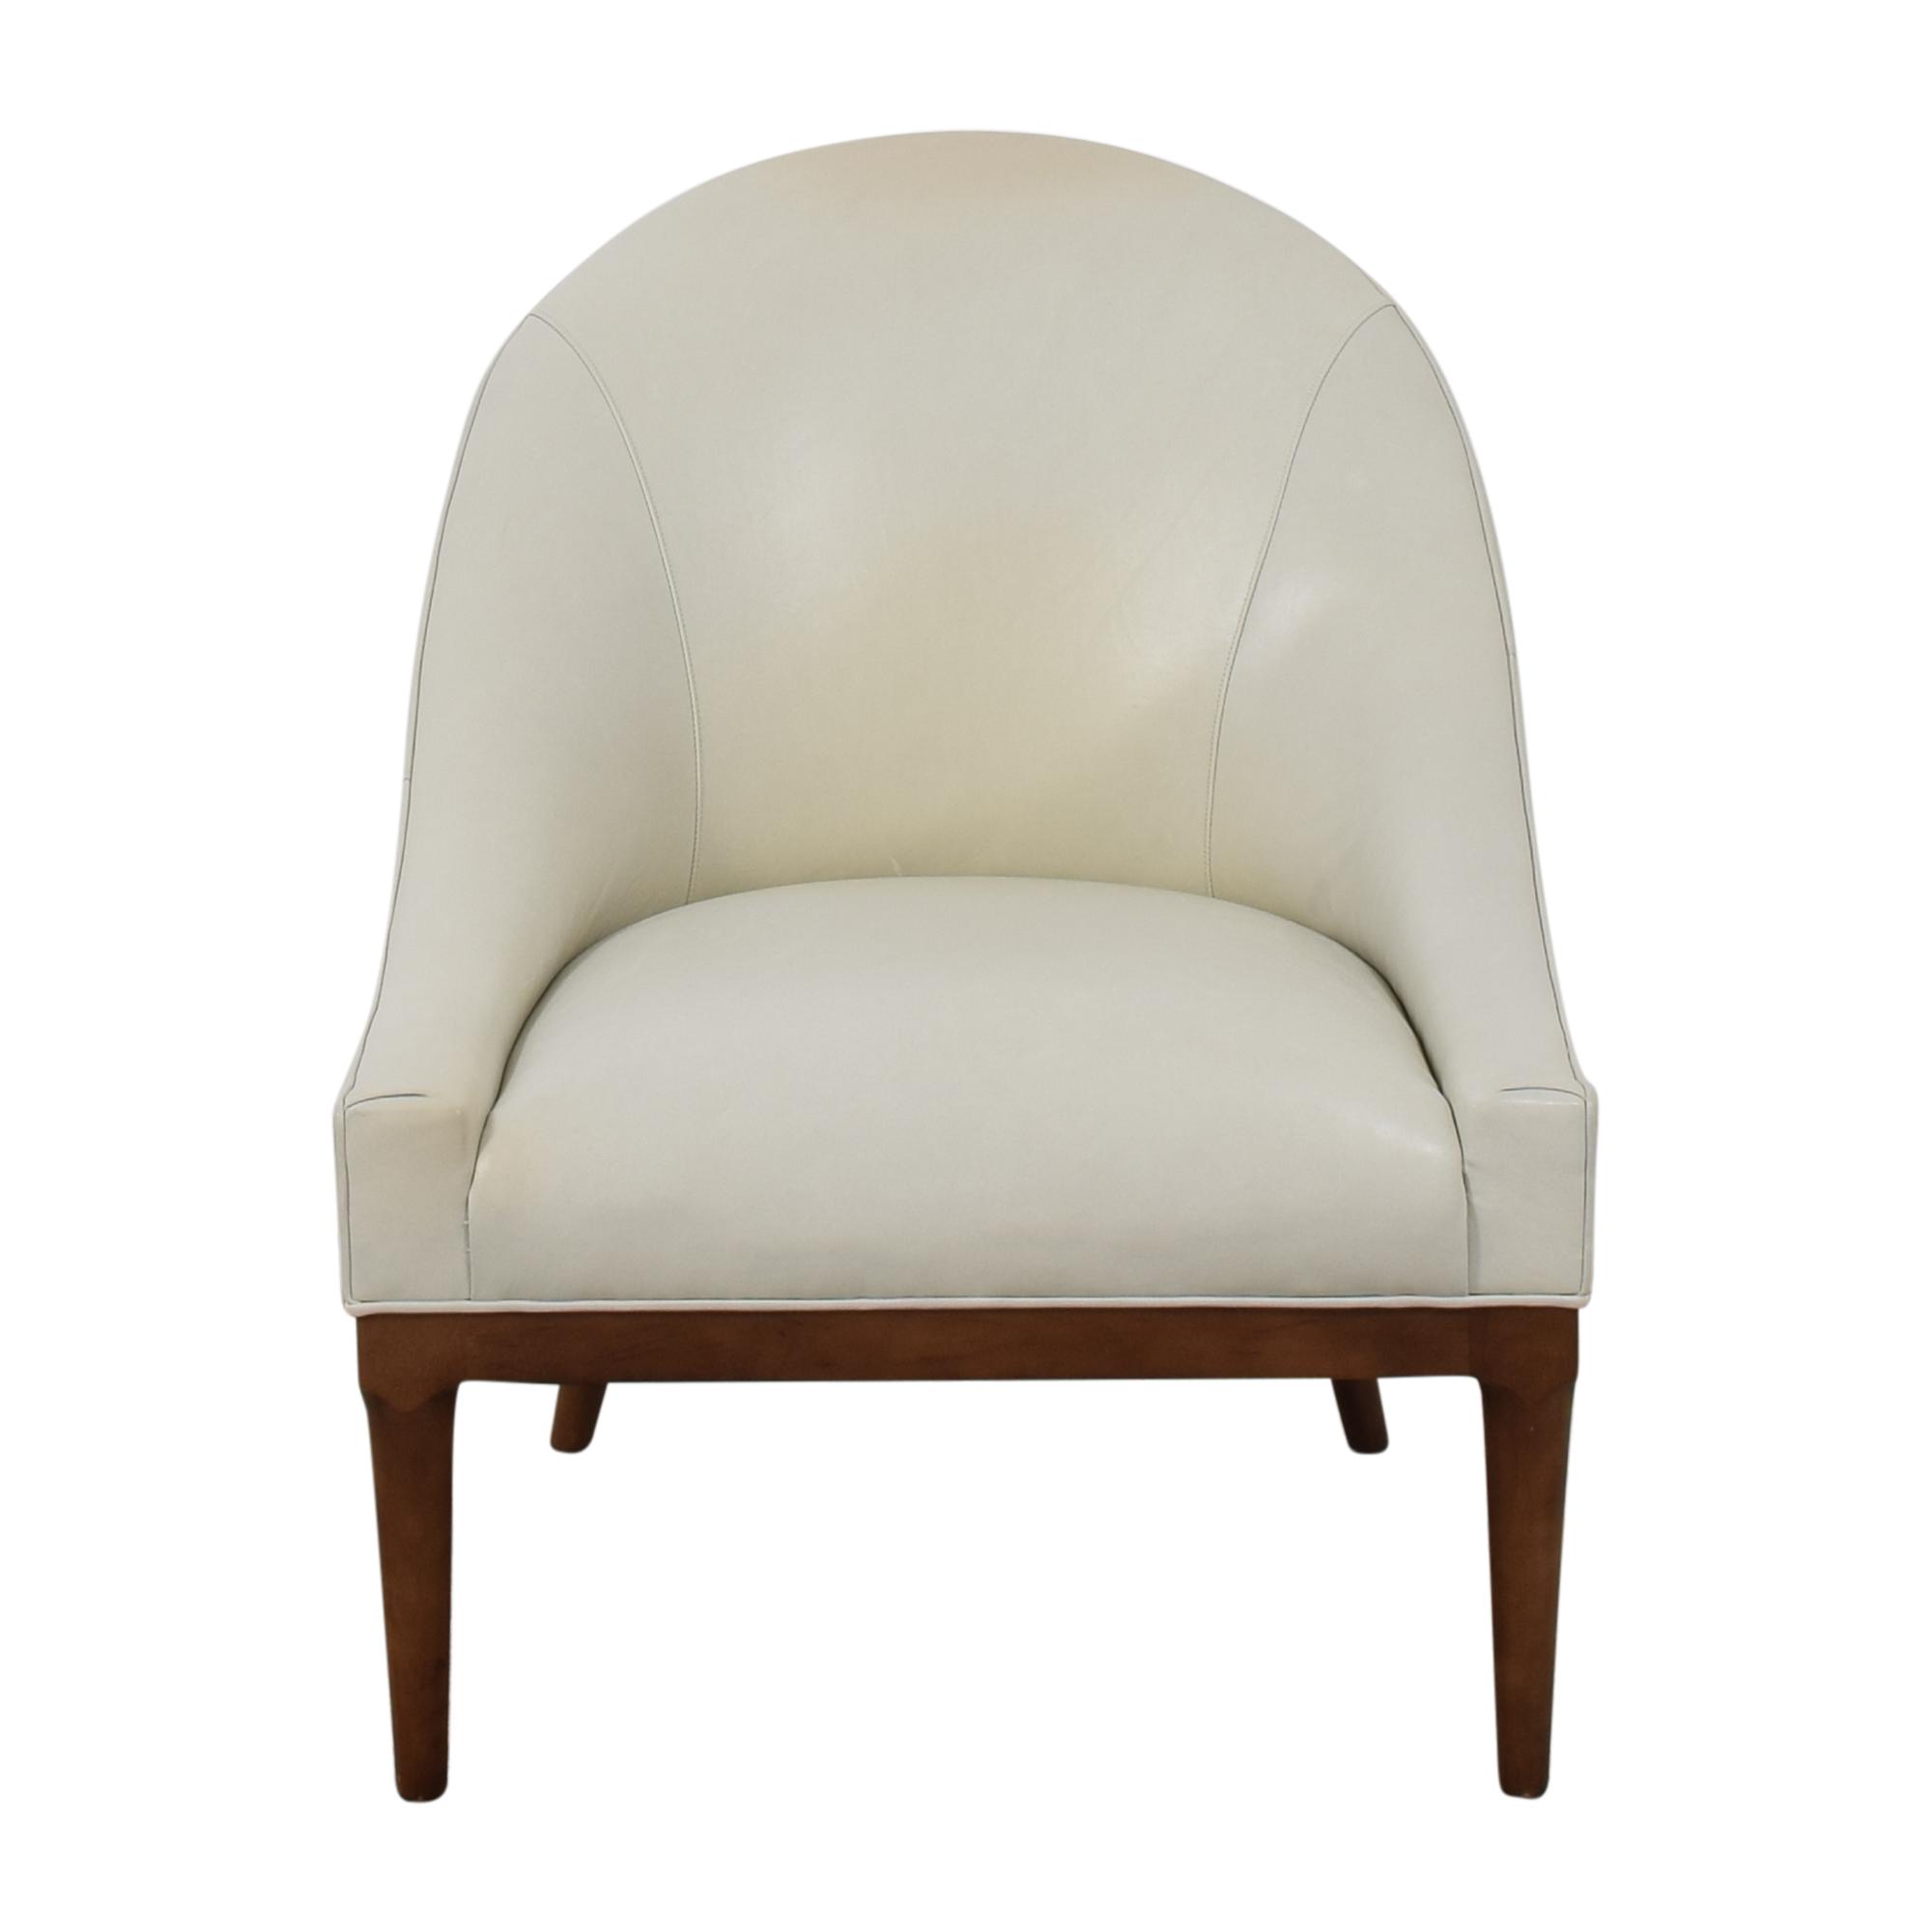 Mitchell Gold + Bob Williams Mitchell Gold + Bob Williams Bella Chair for sale